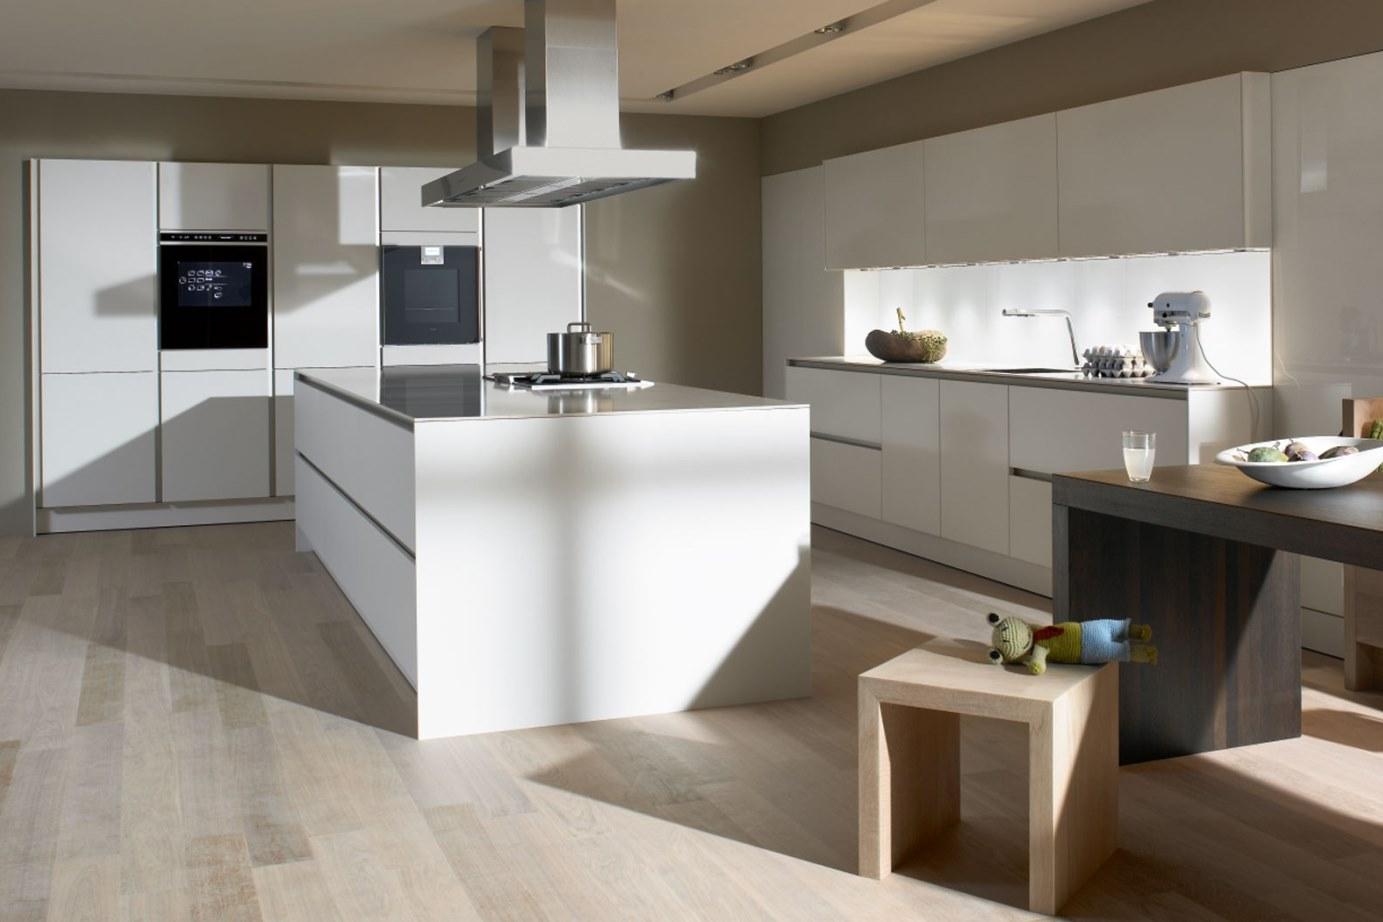 siematic keukens. innovatie en ongekende luxe. - db keukens, Schematic